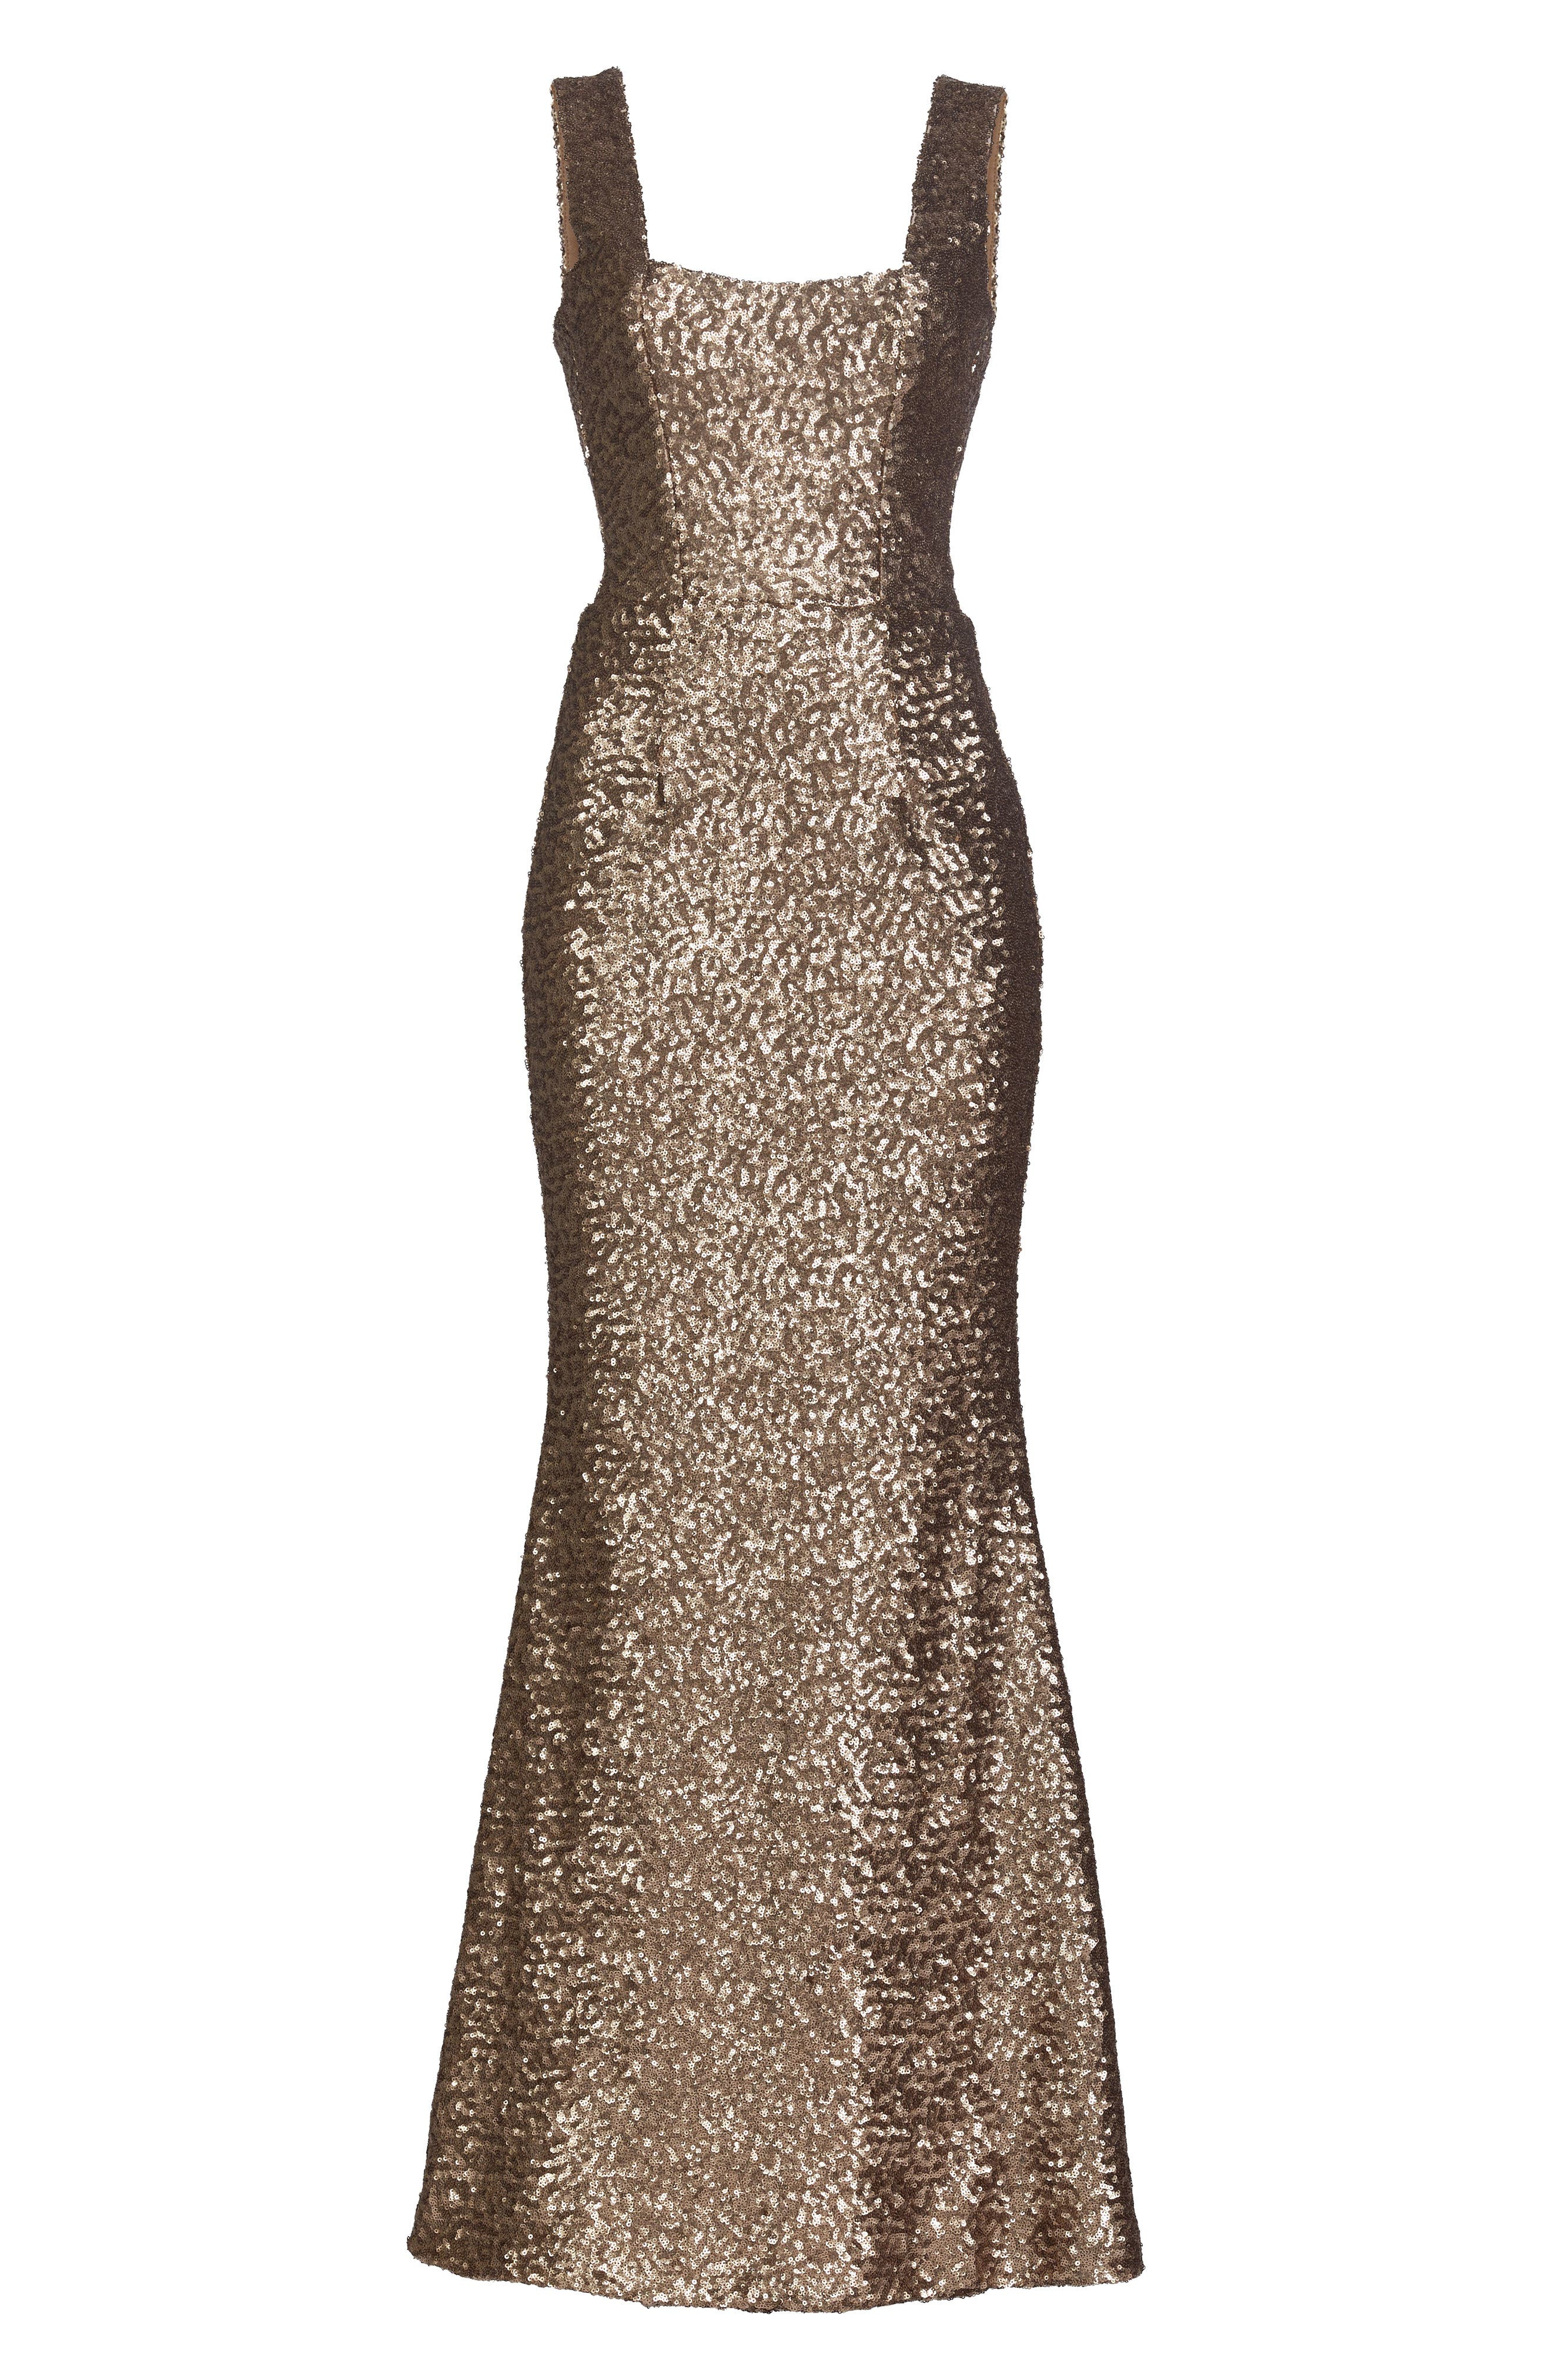 Raven Sequin Gown,                             Alternate thumbnail 4, color,                             Brass